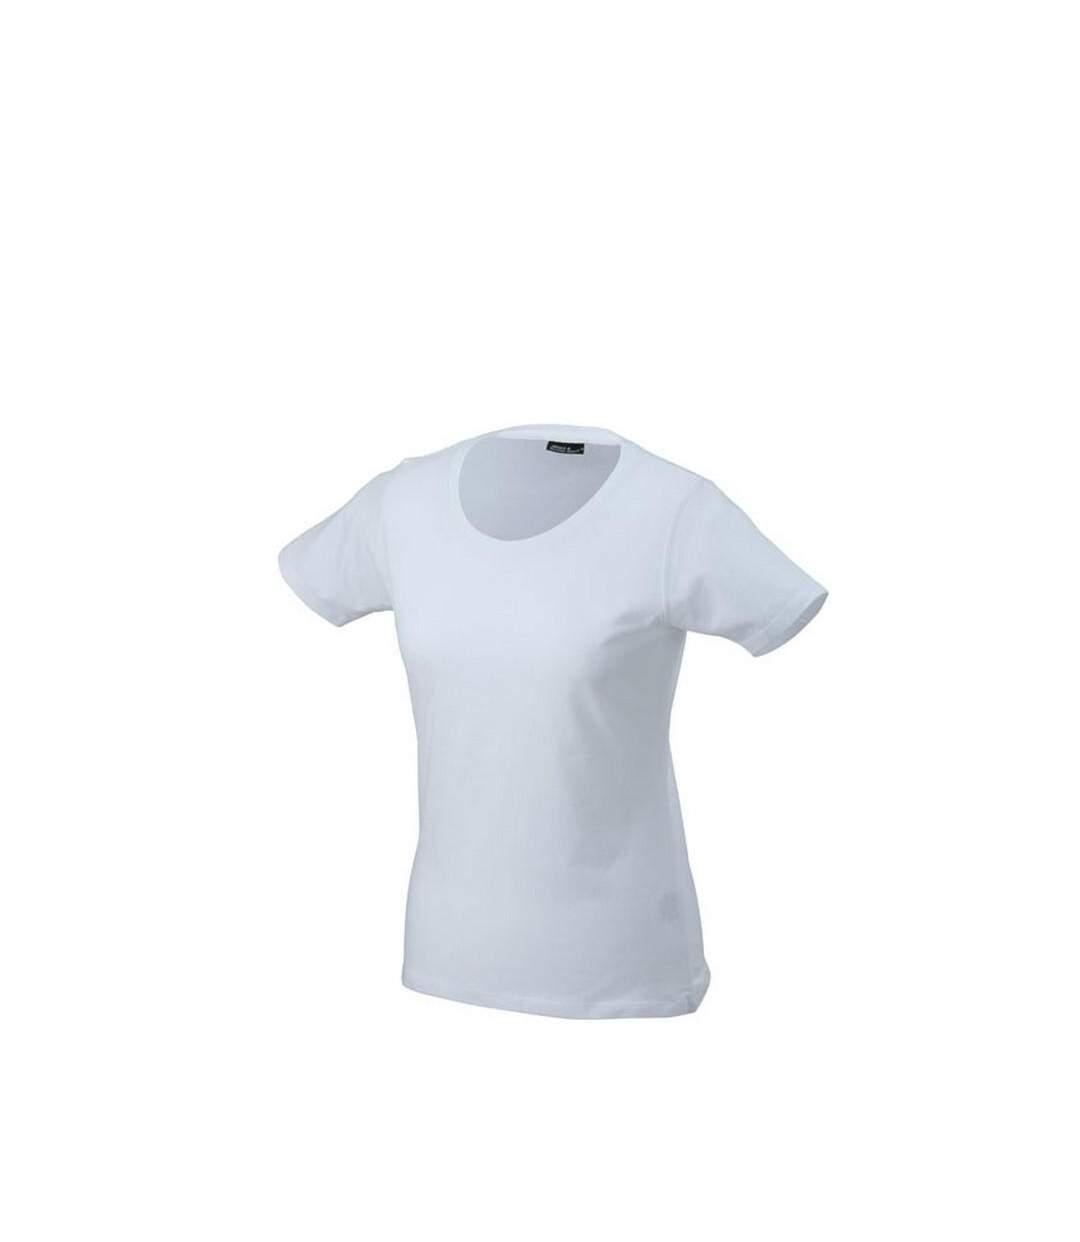 James And Nicholson - T-Shirt - Femme (Blanc) - UTFU103